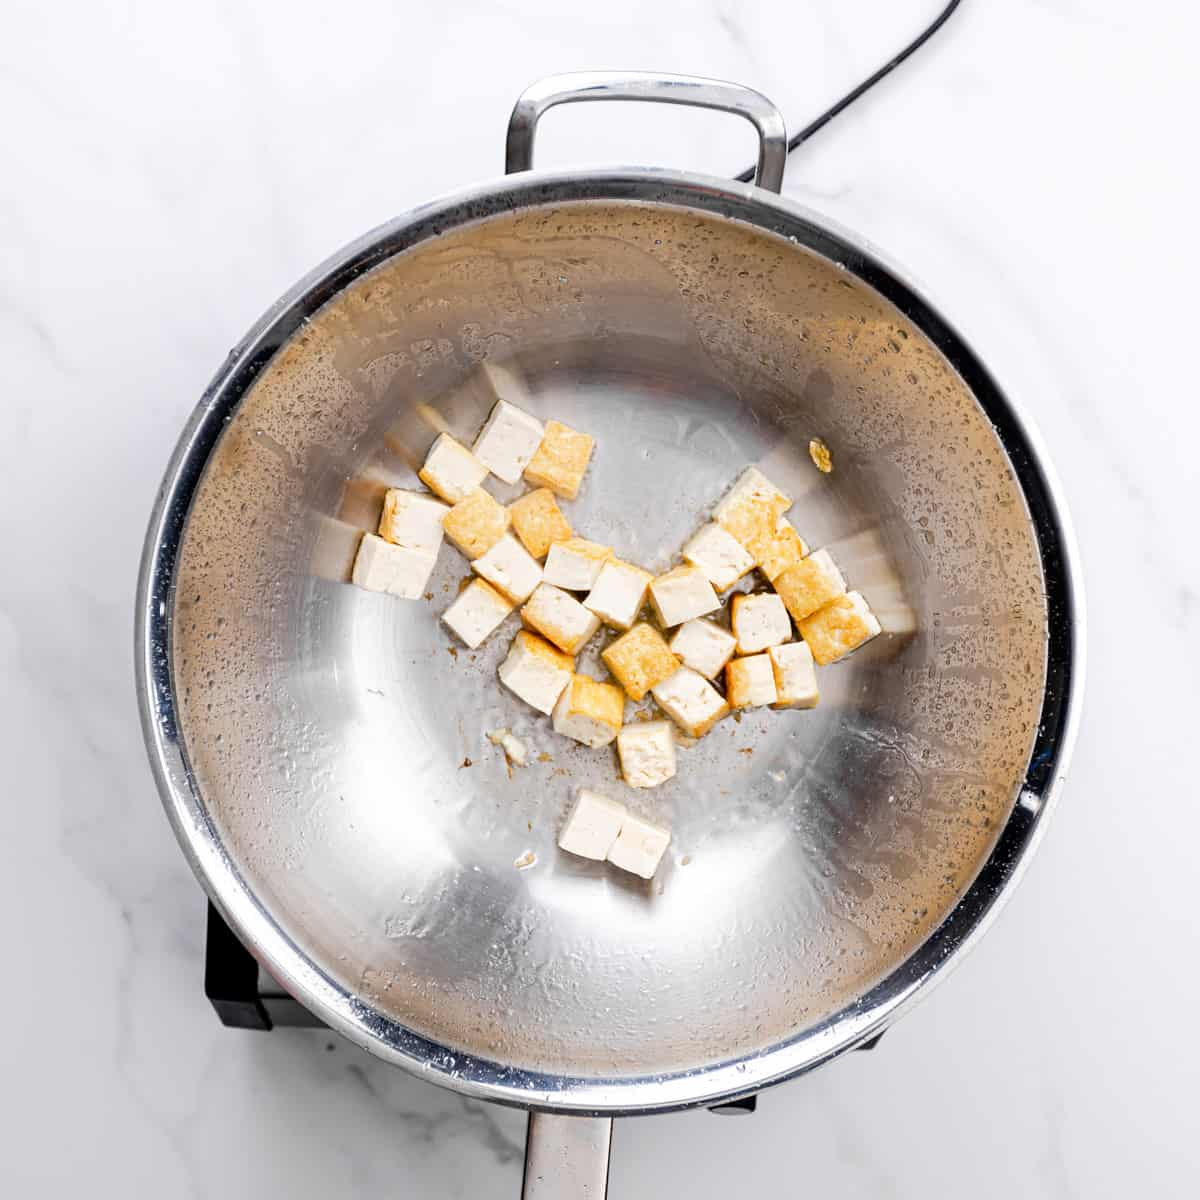 stir fry tofu.